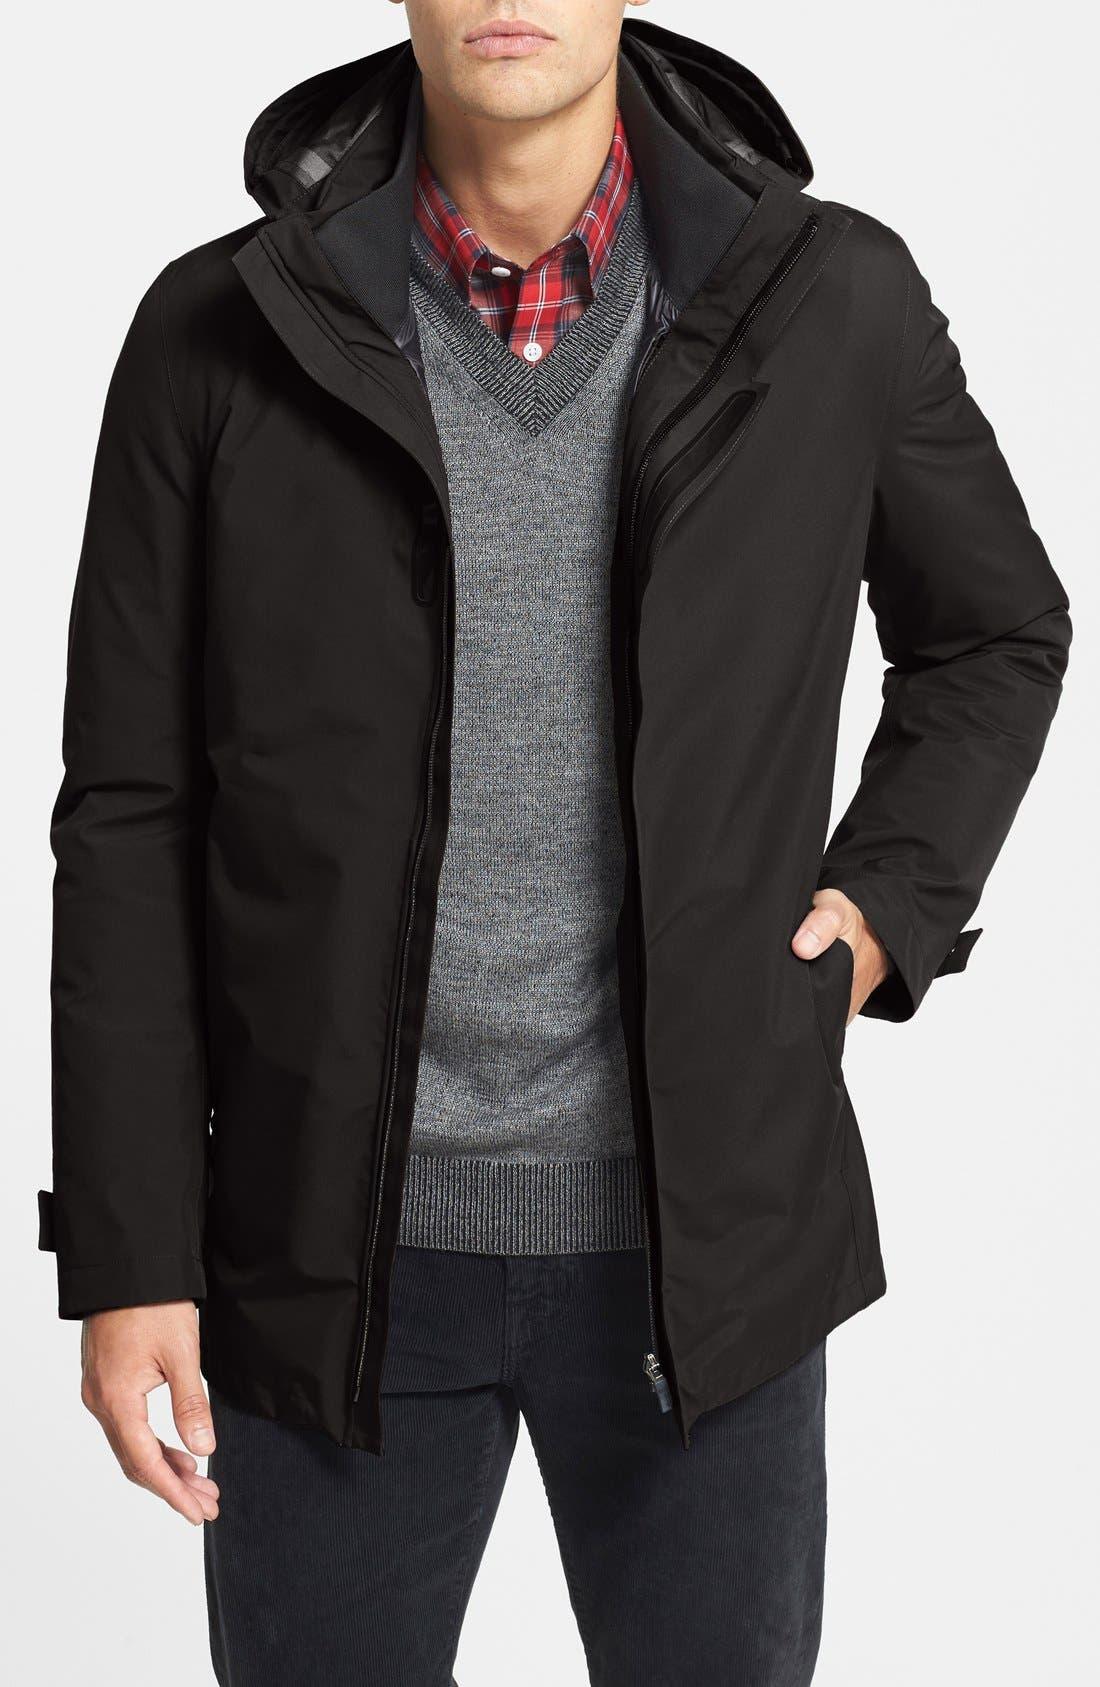 HERNO 'Laminar' Waterproof Gore-Tex<sup>®</sup> 3-in-1 Jacket, Main, color, 001